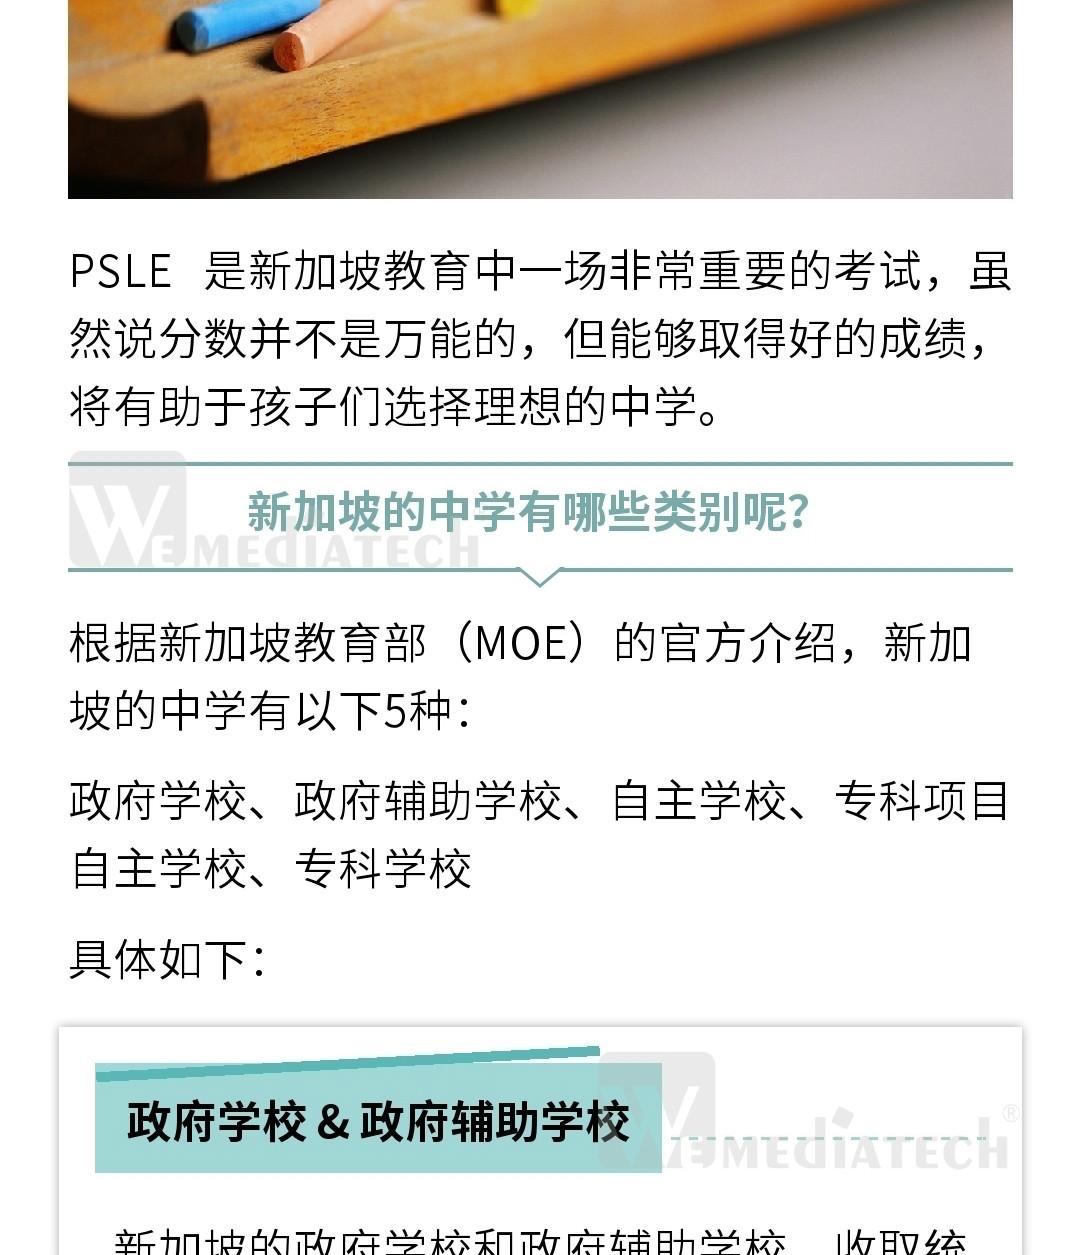 zhongxue-2_qietu_4.jpg